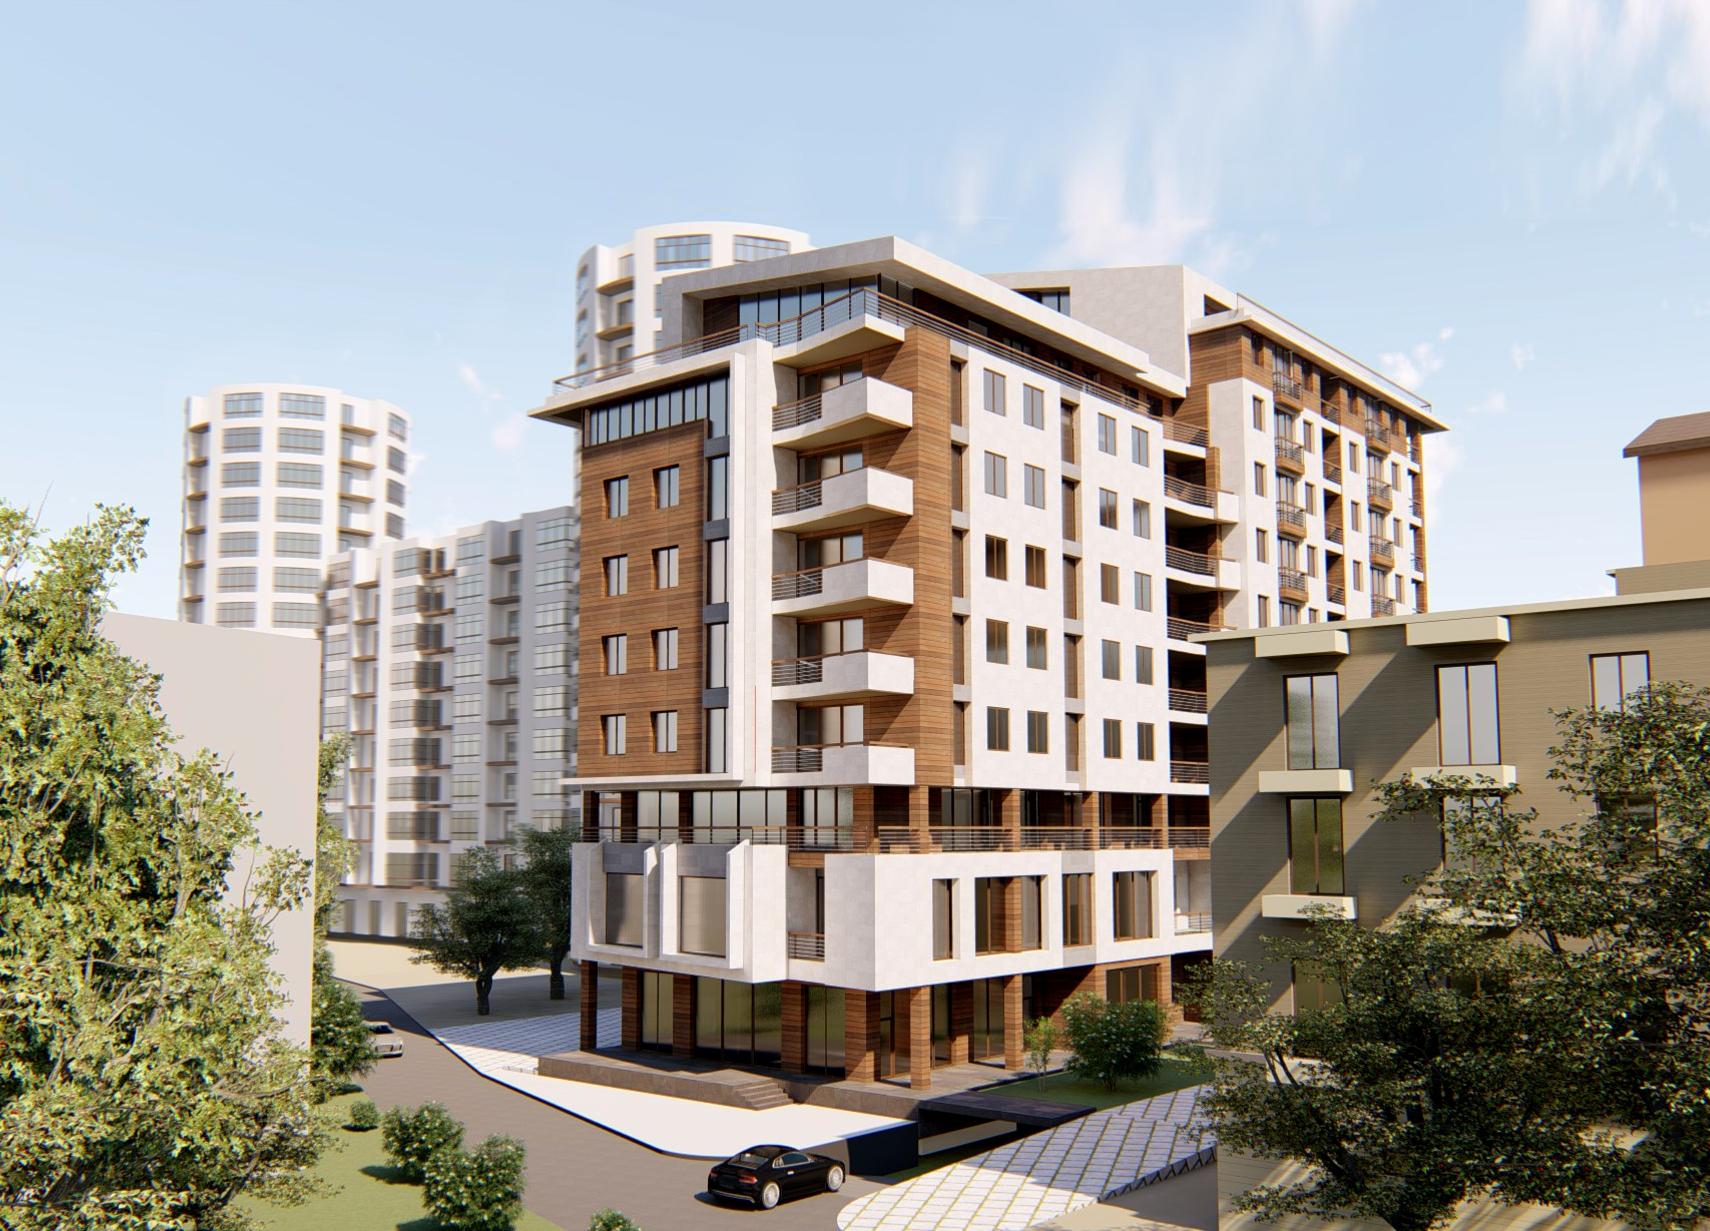 Residence at Verin Antarayin - featured image